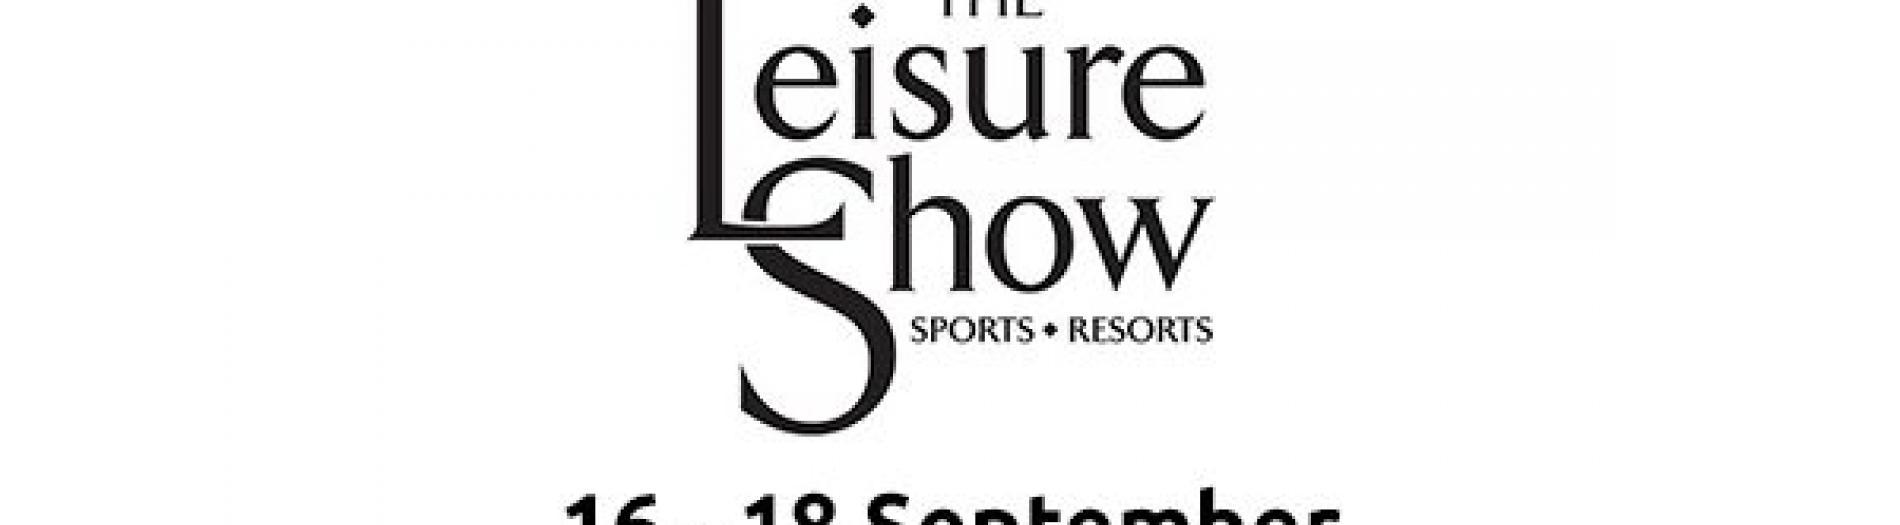 Mousses Etoiles au Dubai Leisure Show 2018